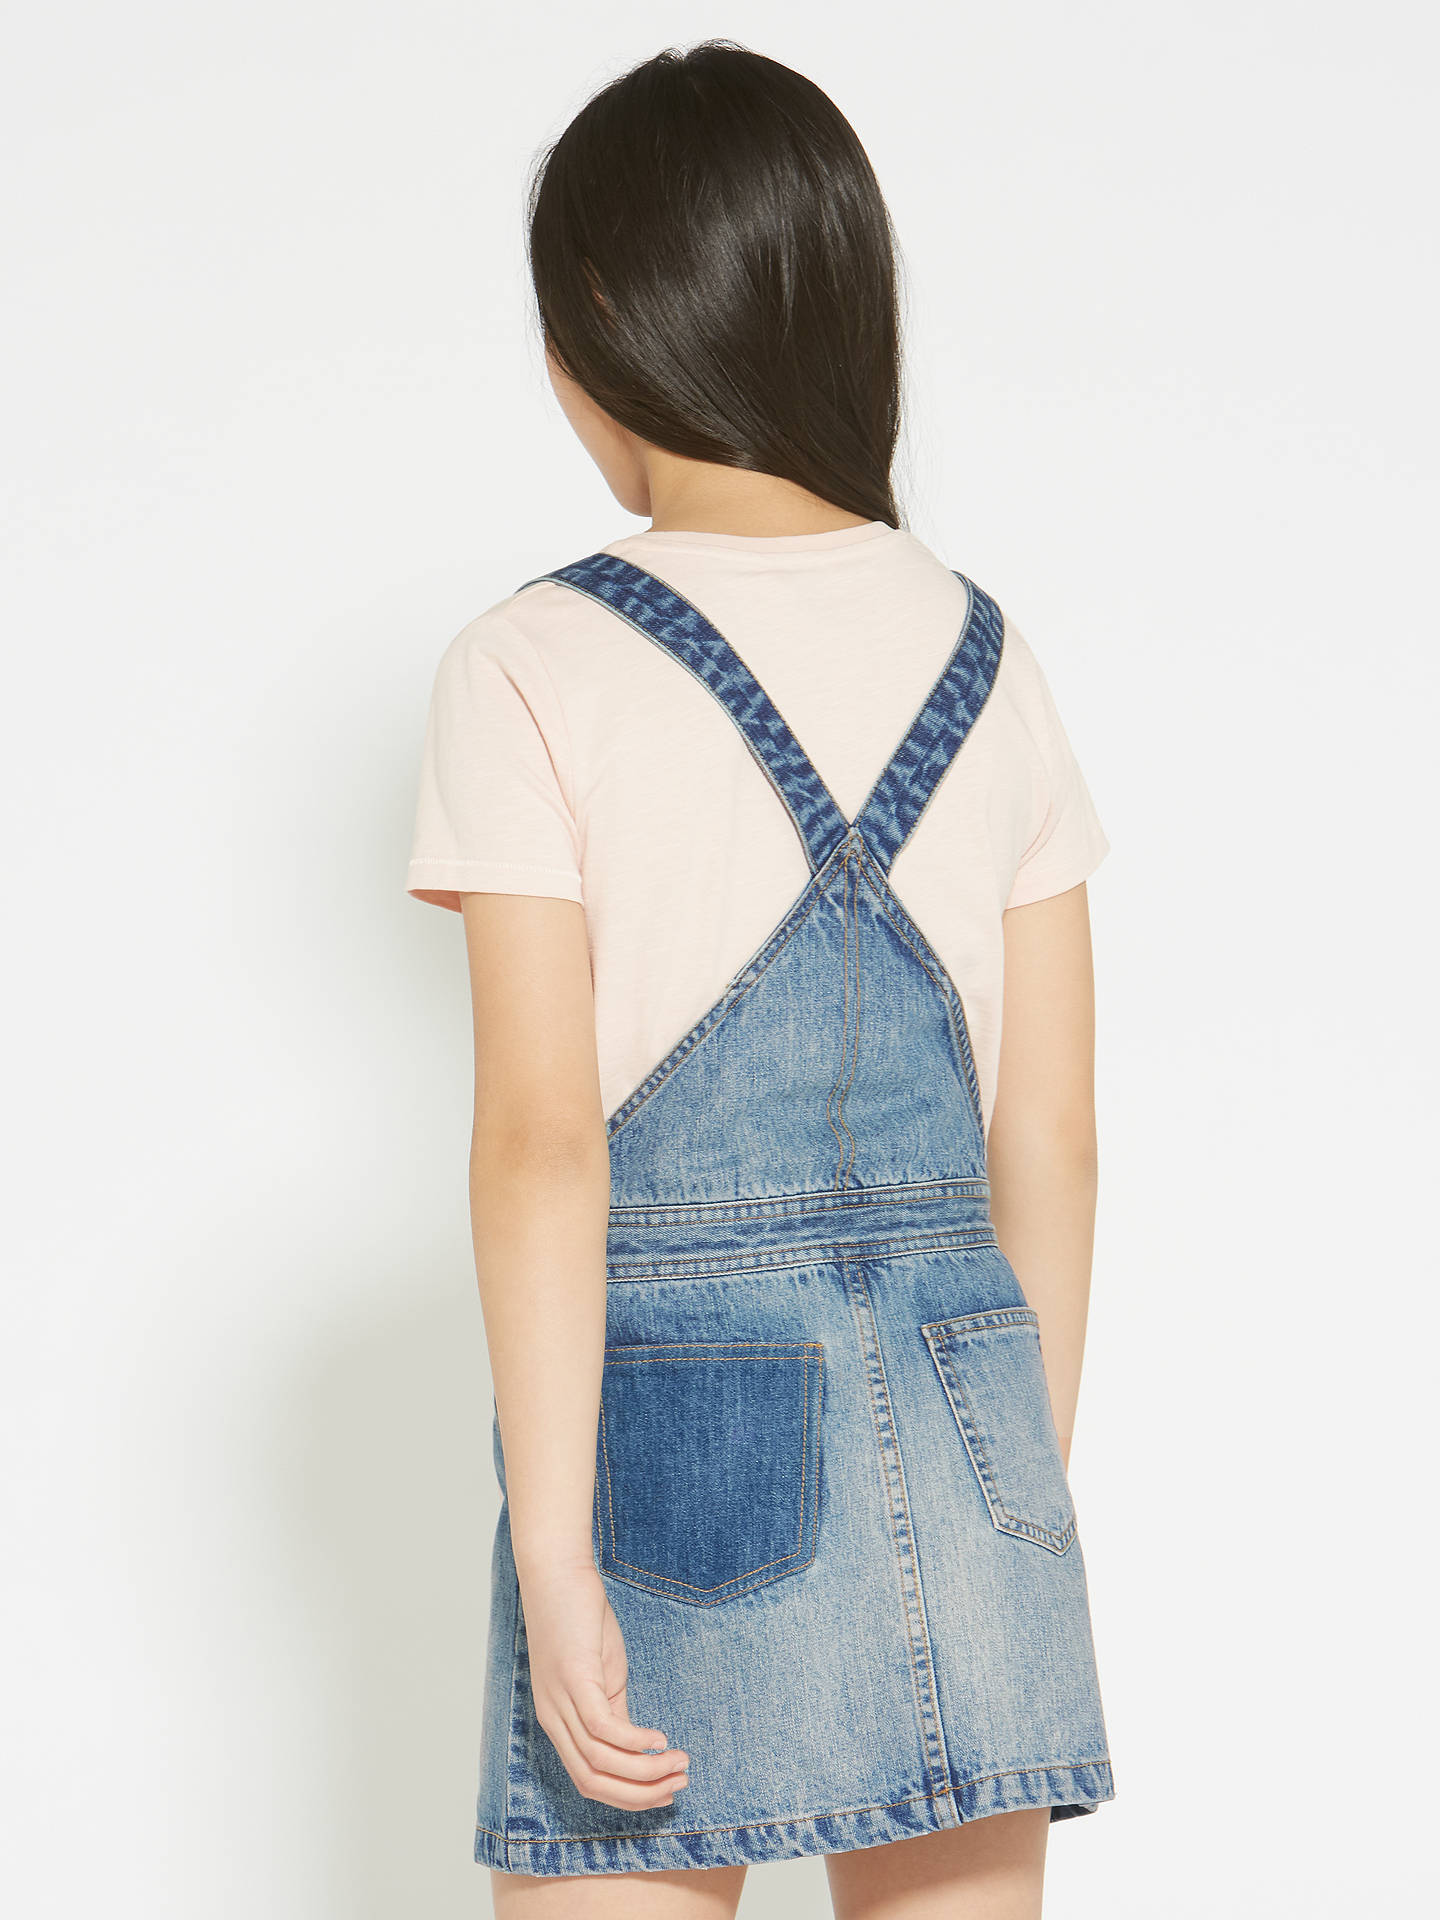 1ed414a003fa ... Buy John Lewis & Partners Girls' Denim Pinafore Dress, Blue, 8 yrs  Online